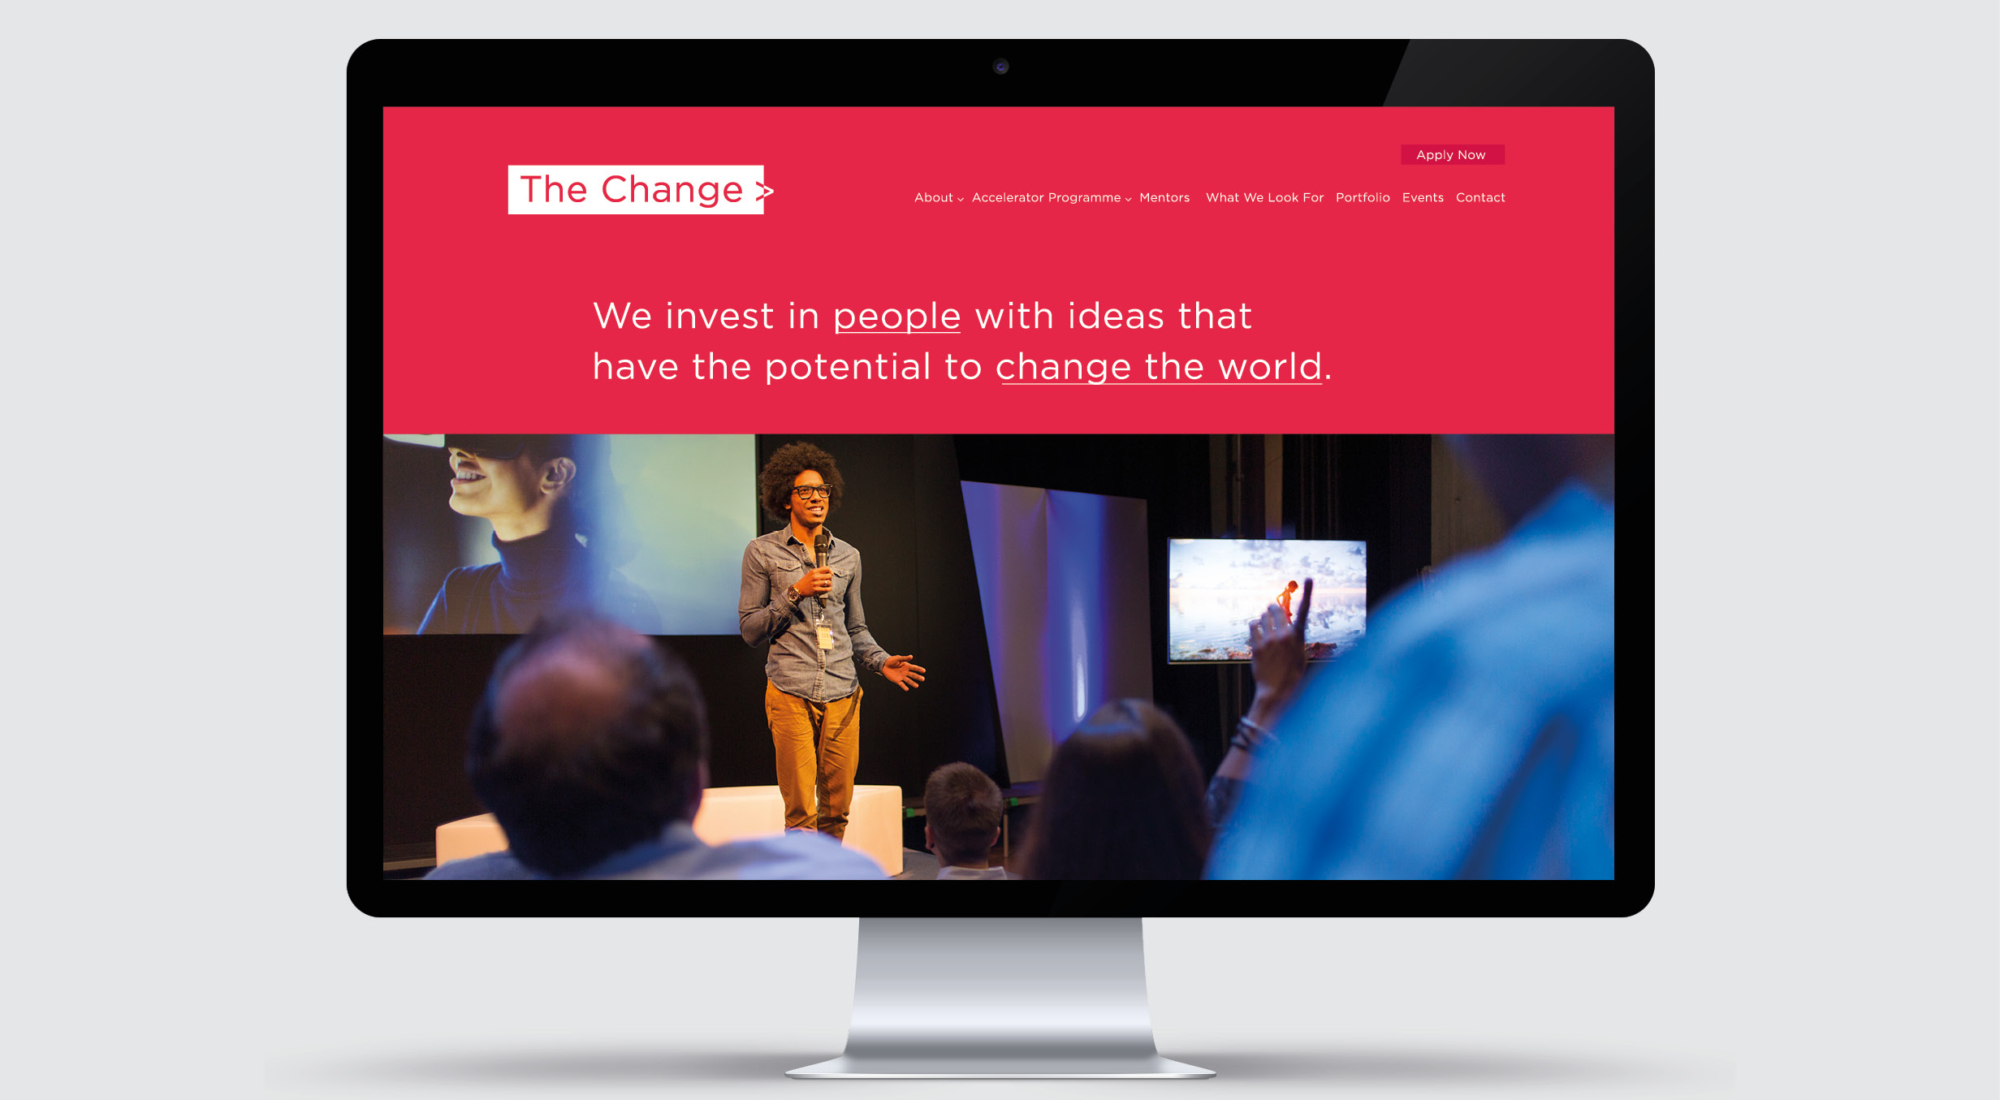 https://alanjacksondesign.co.uk/wp-content/uploads/2021/09/the-change-img6.jpg